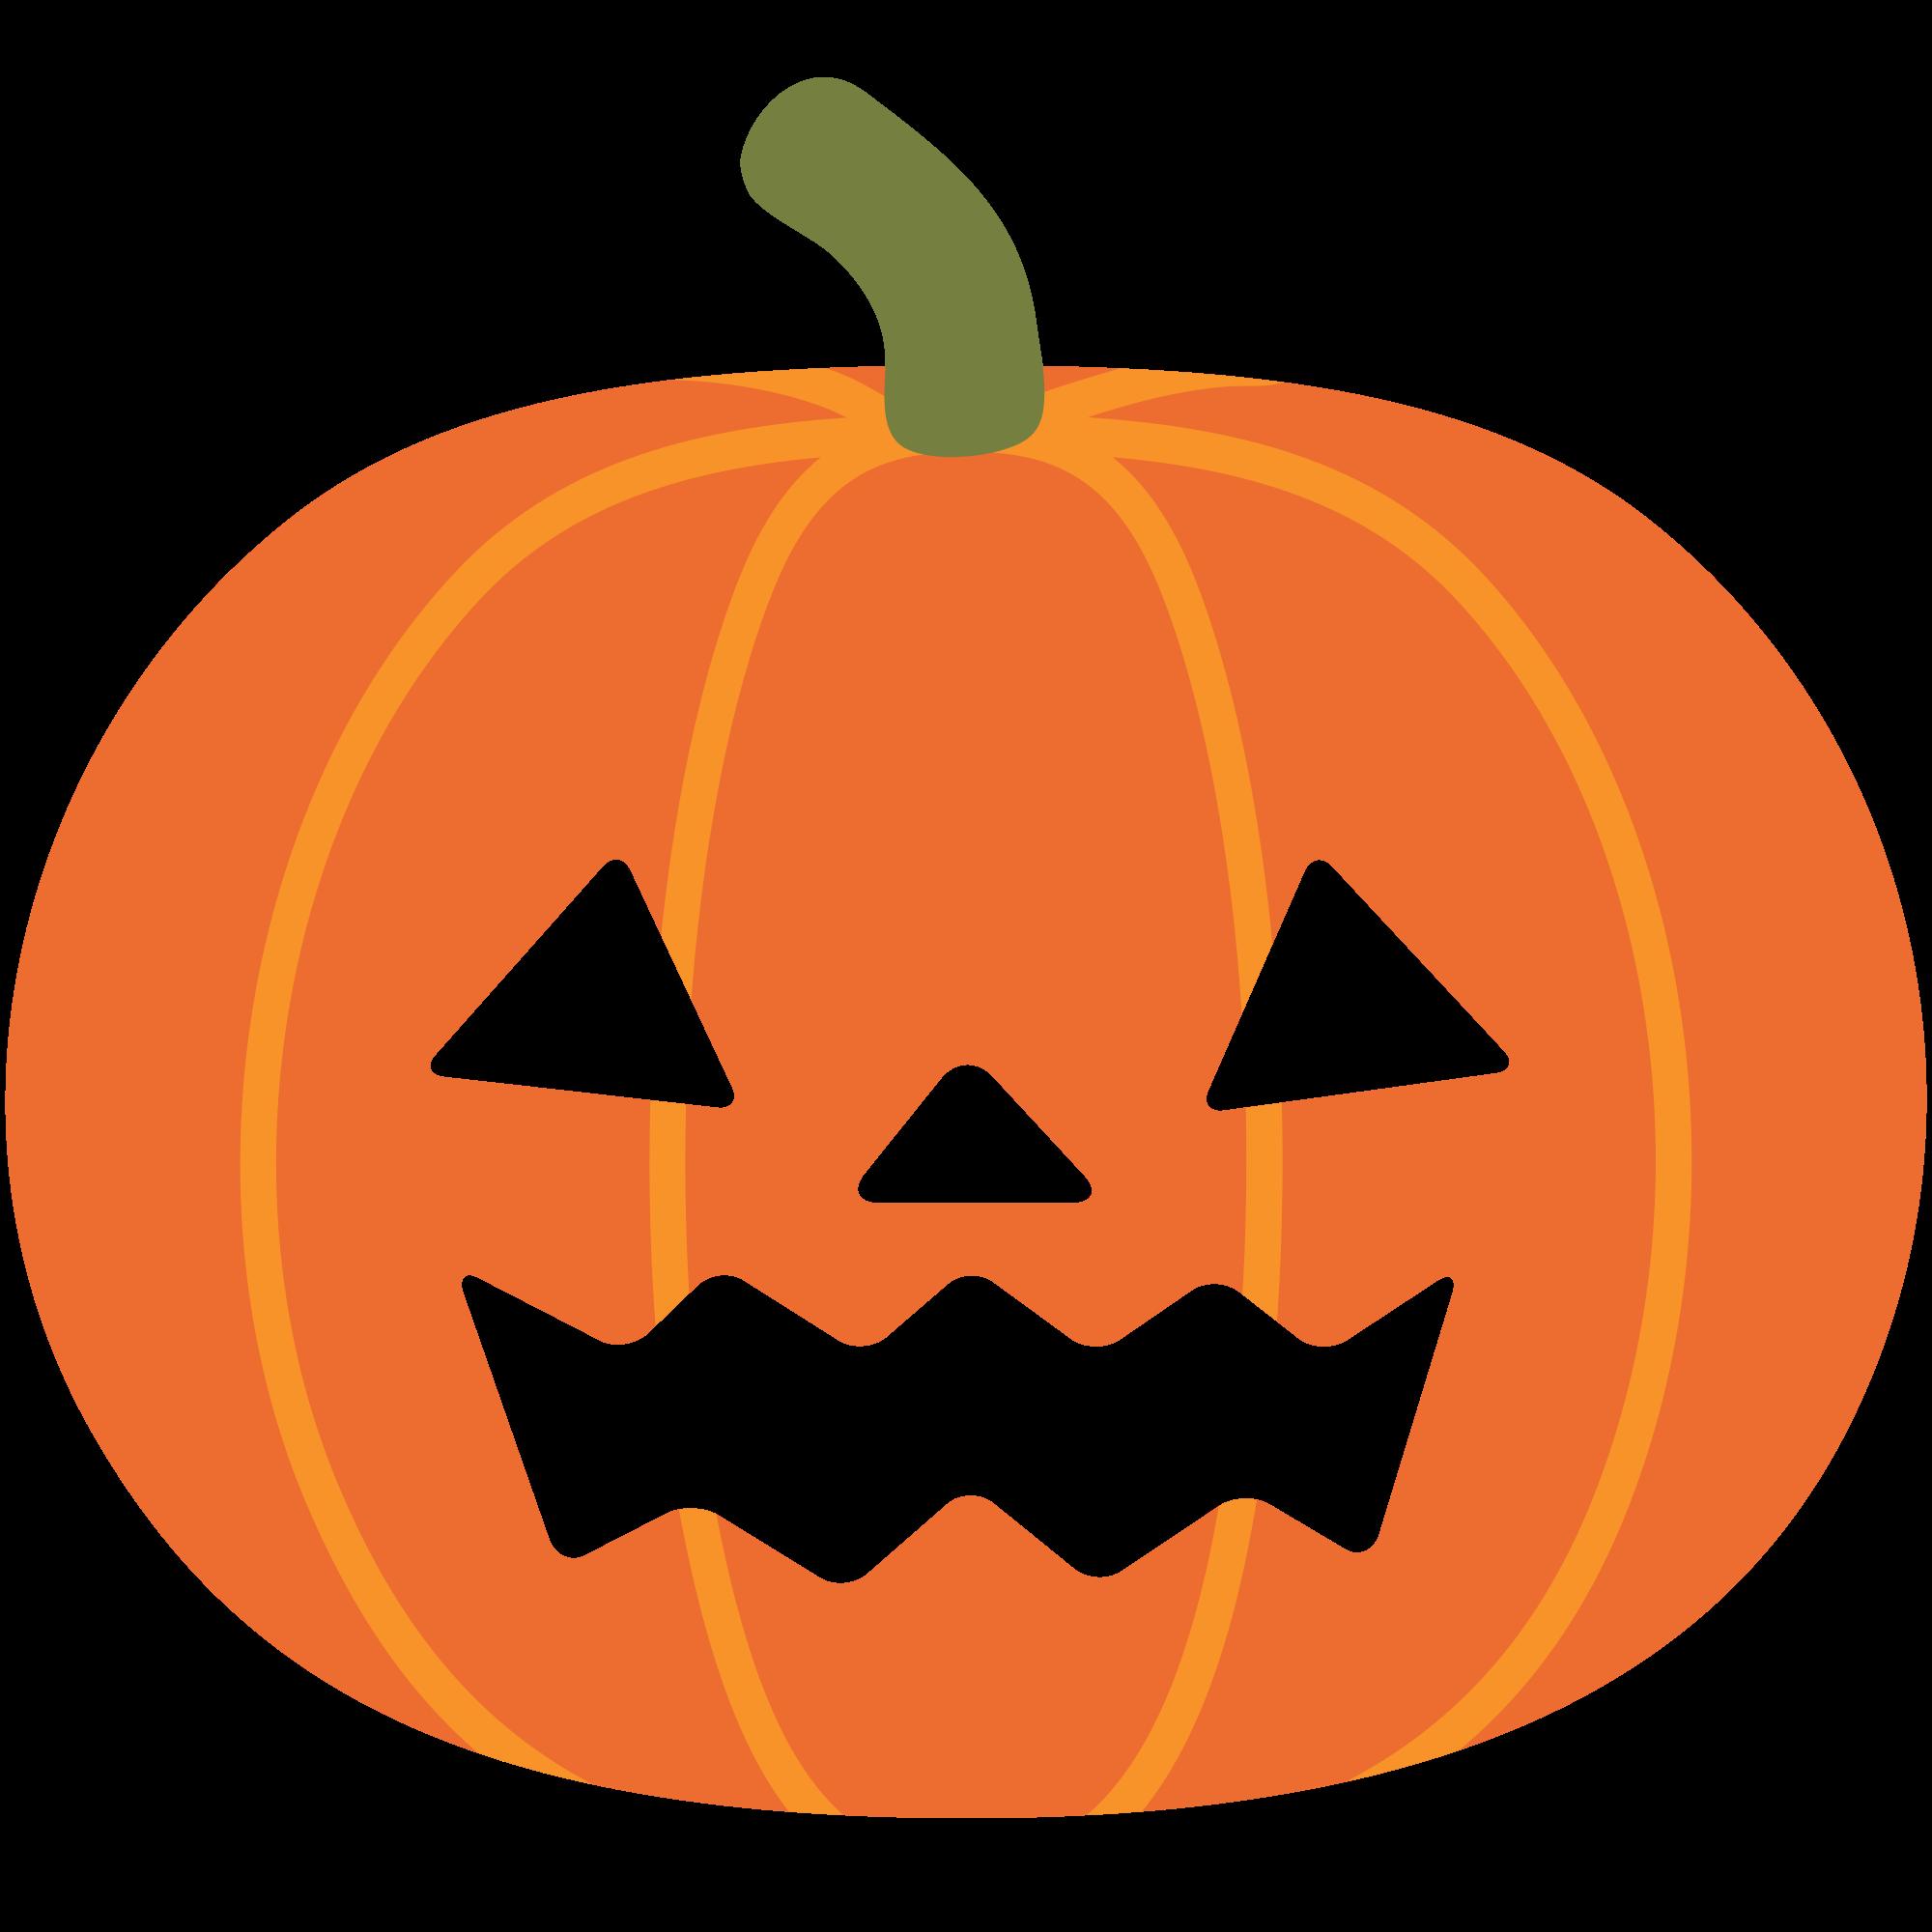 Pumpkin clipart svg clipart royalty free File:Emoji u1f383.svg - Wikimedia Commons clipart royalty free